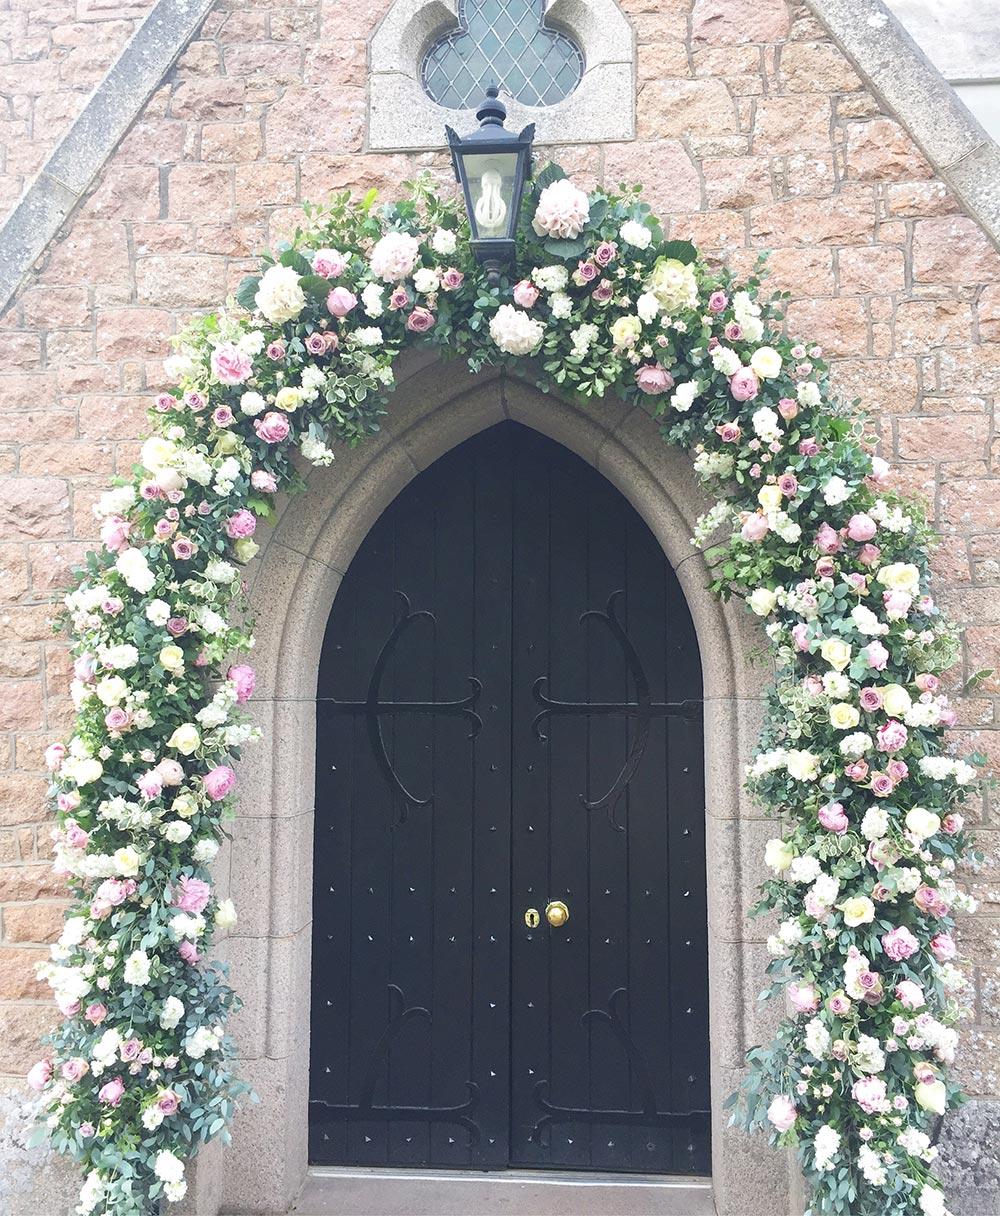 4-wilde-thyme-wedding-flowers-design-church-decor-trinity-jersey-genuine-jersey-peonies.jpg